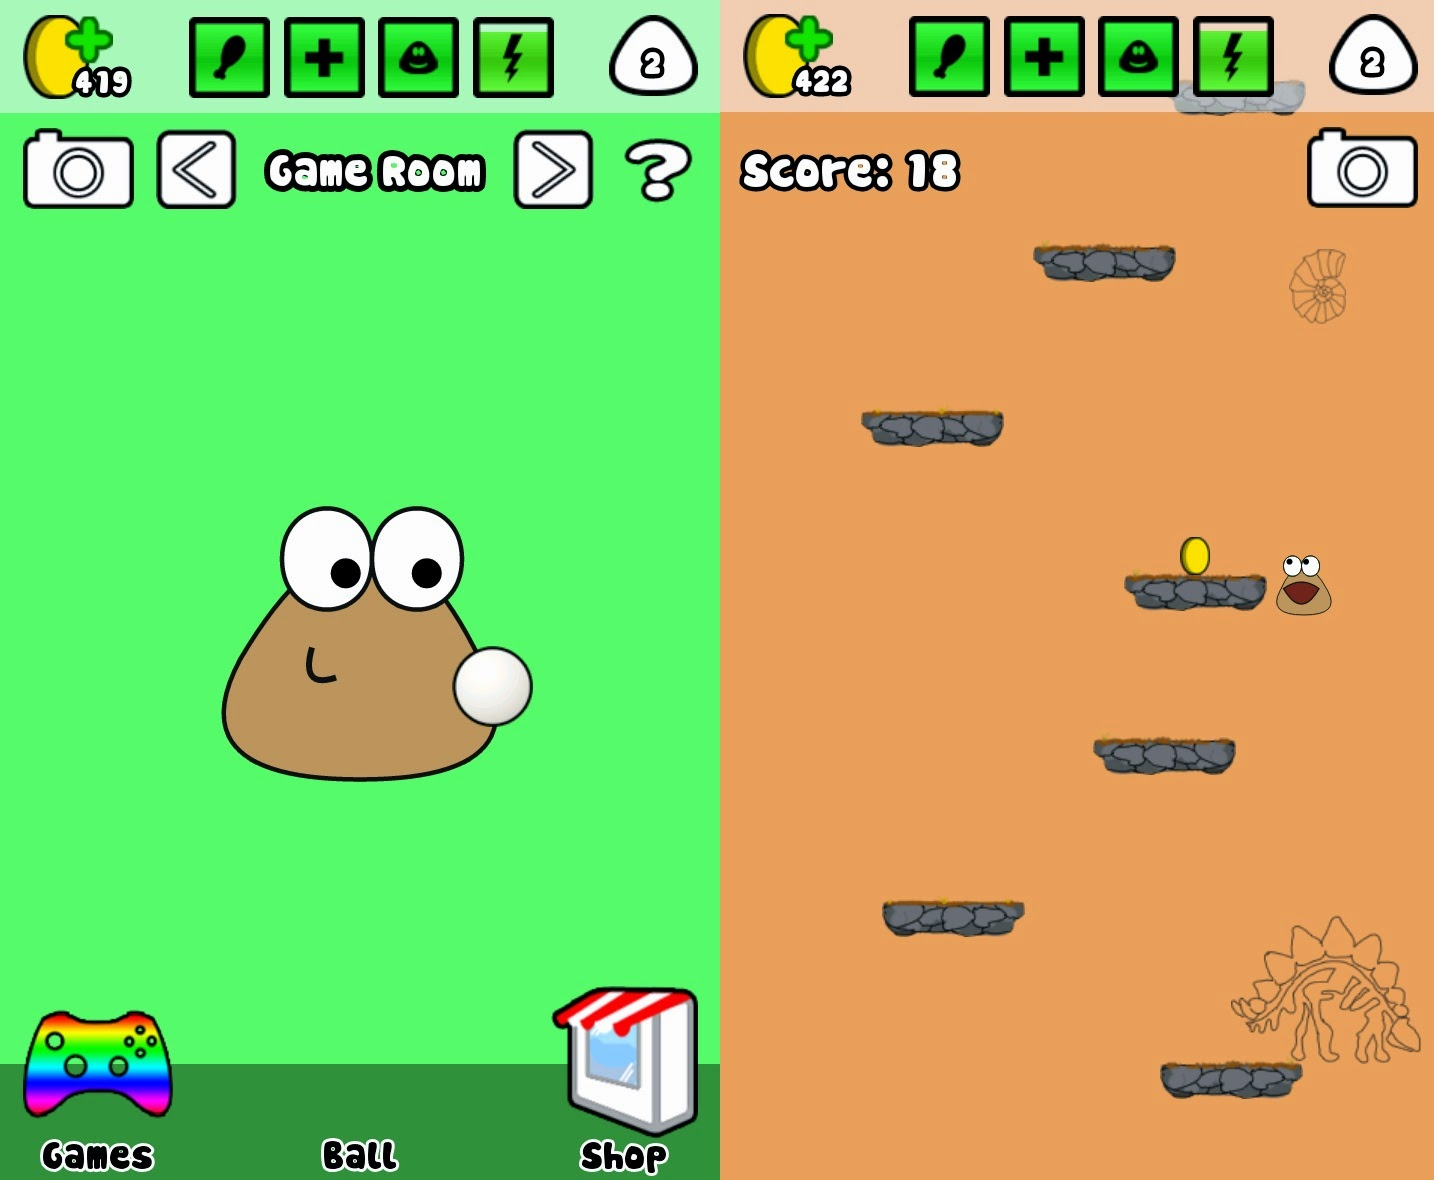 Download Pou v1.4.57 Apk Terbaru | download game android ...